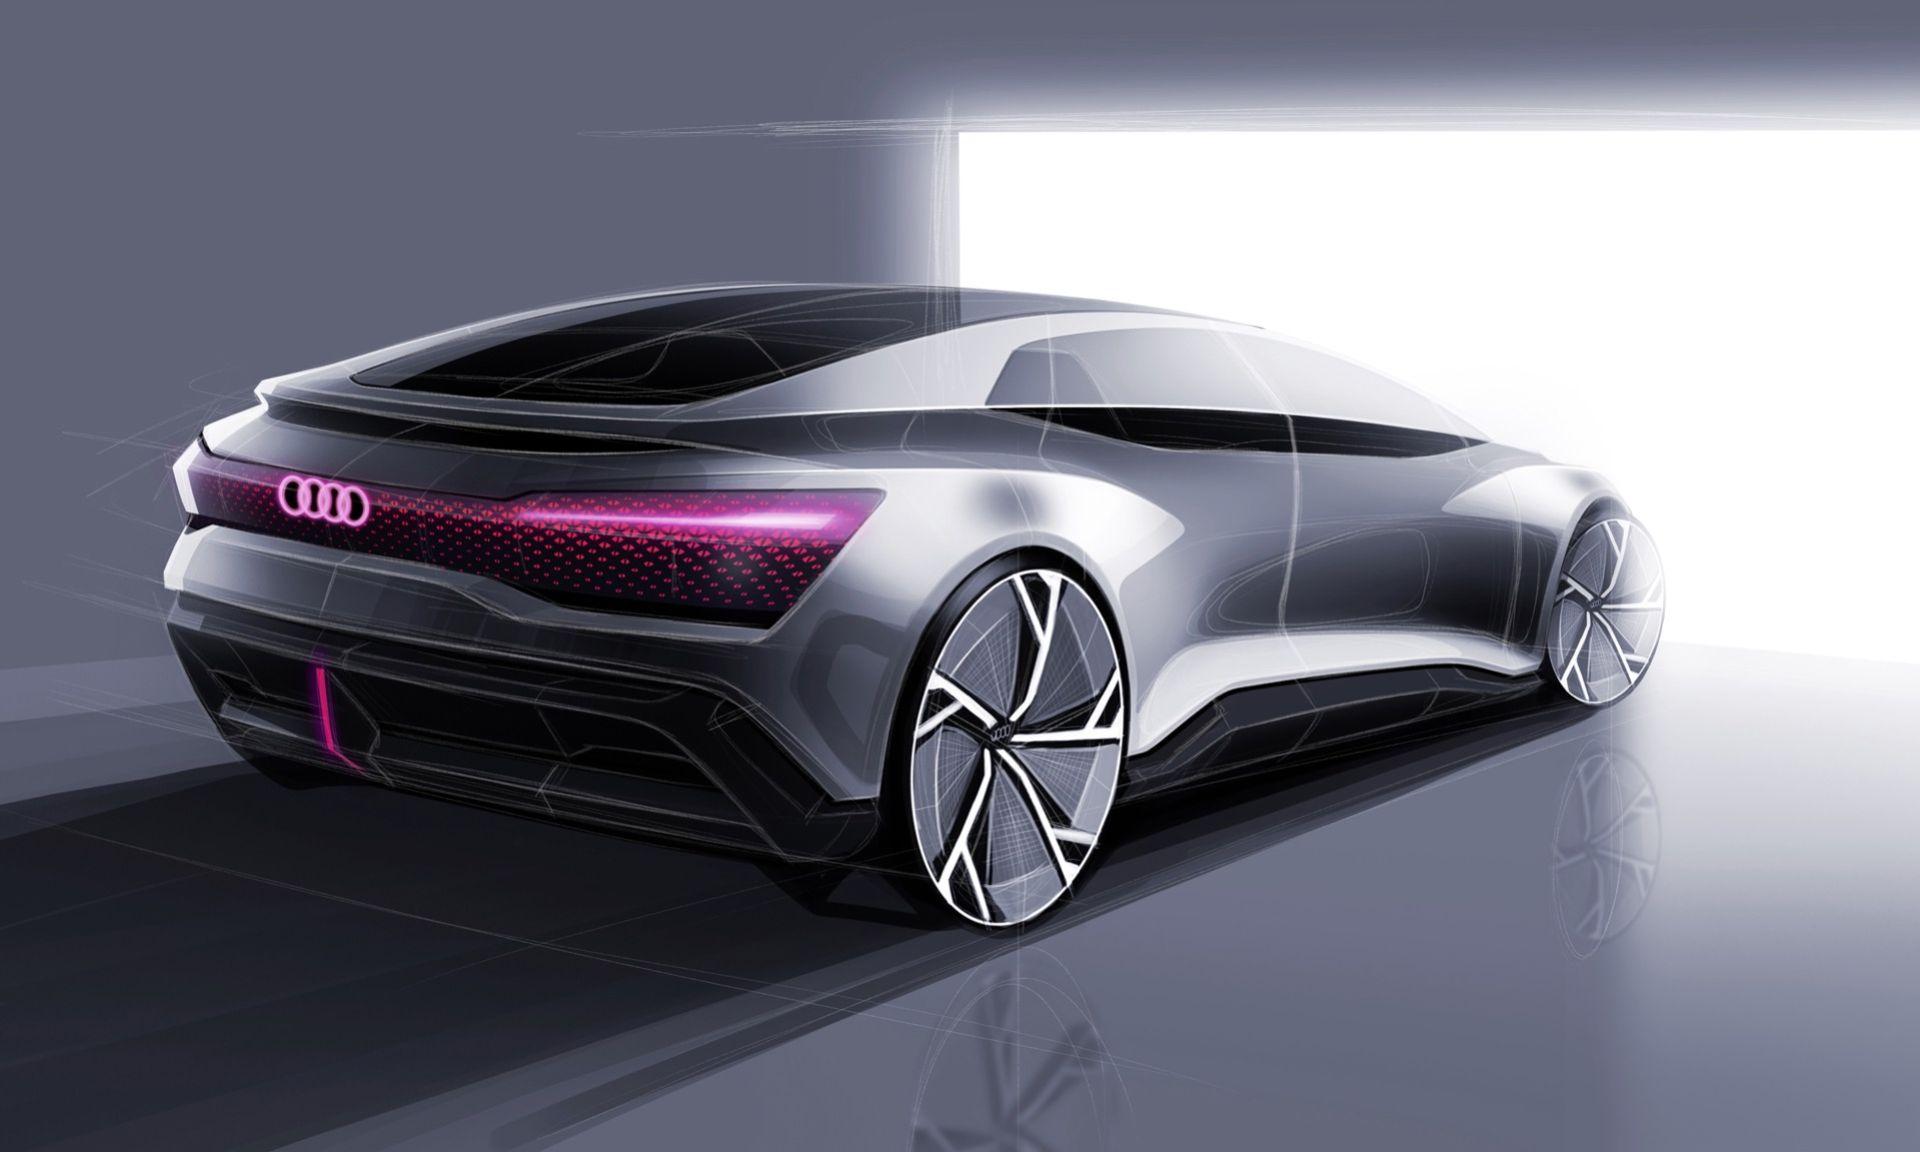 Volkswagenkoncernens eldrivna flaggskepp kommer 2024